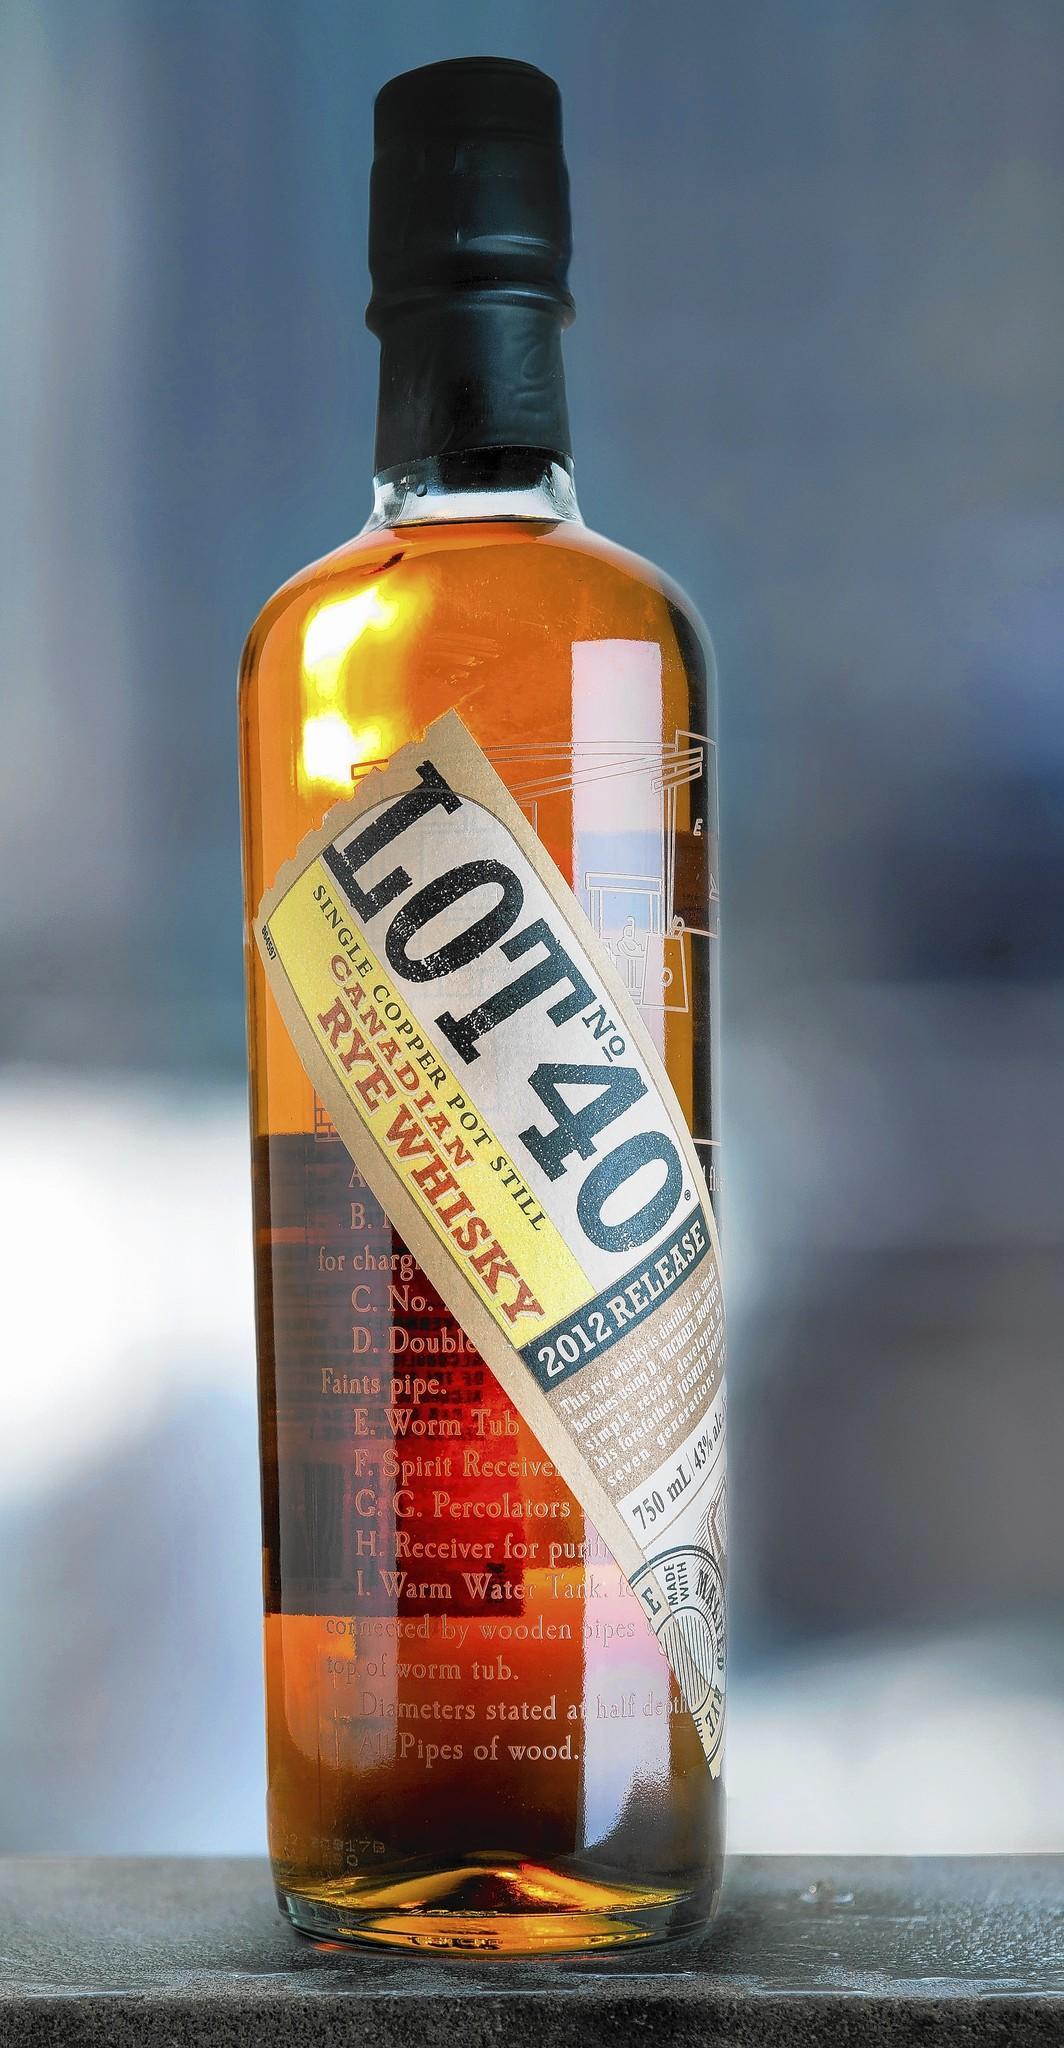 A bottle of Lot #40 Canadian Rye Whisky.